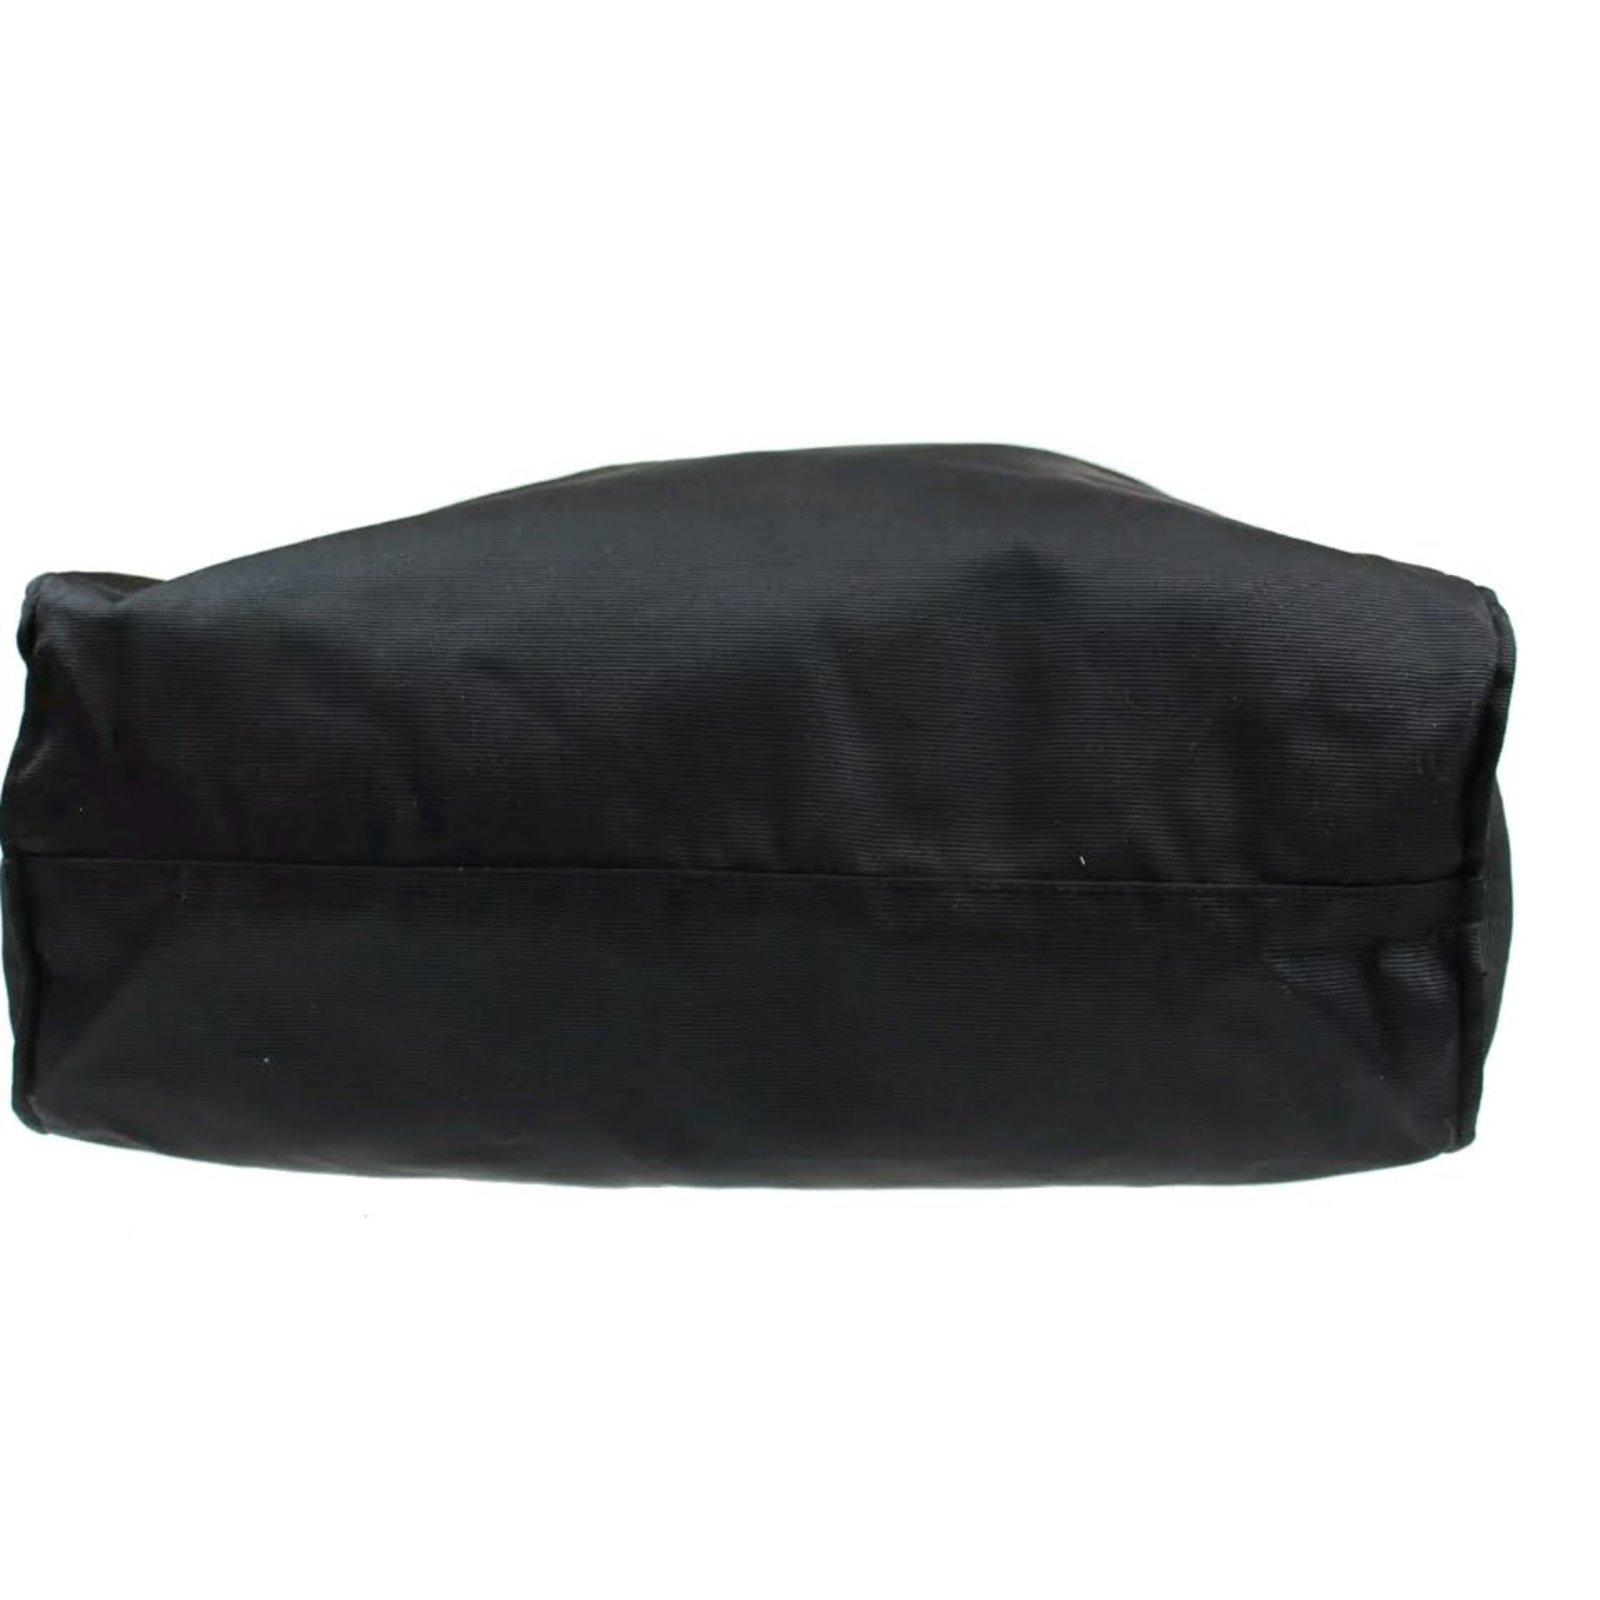 729c201348ae Facebook · Pin This. Fendi fendi logo large black tote bag Totes Nylon  Black ref.65224